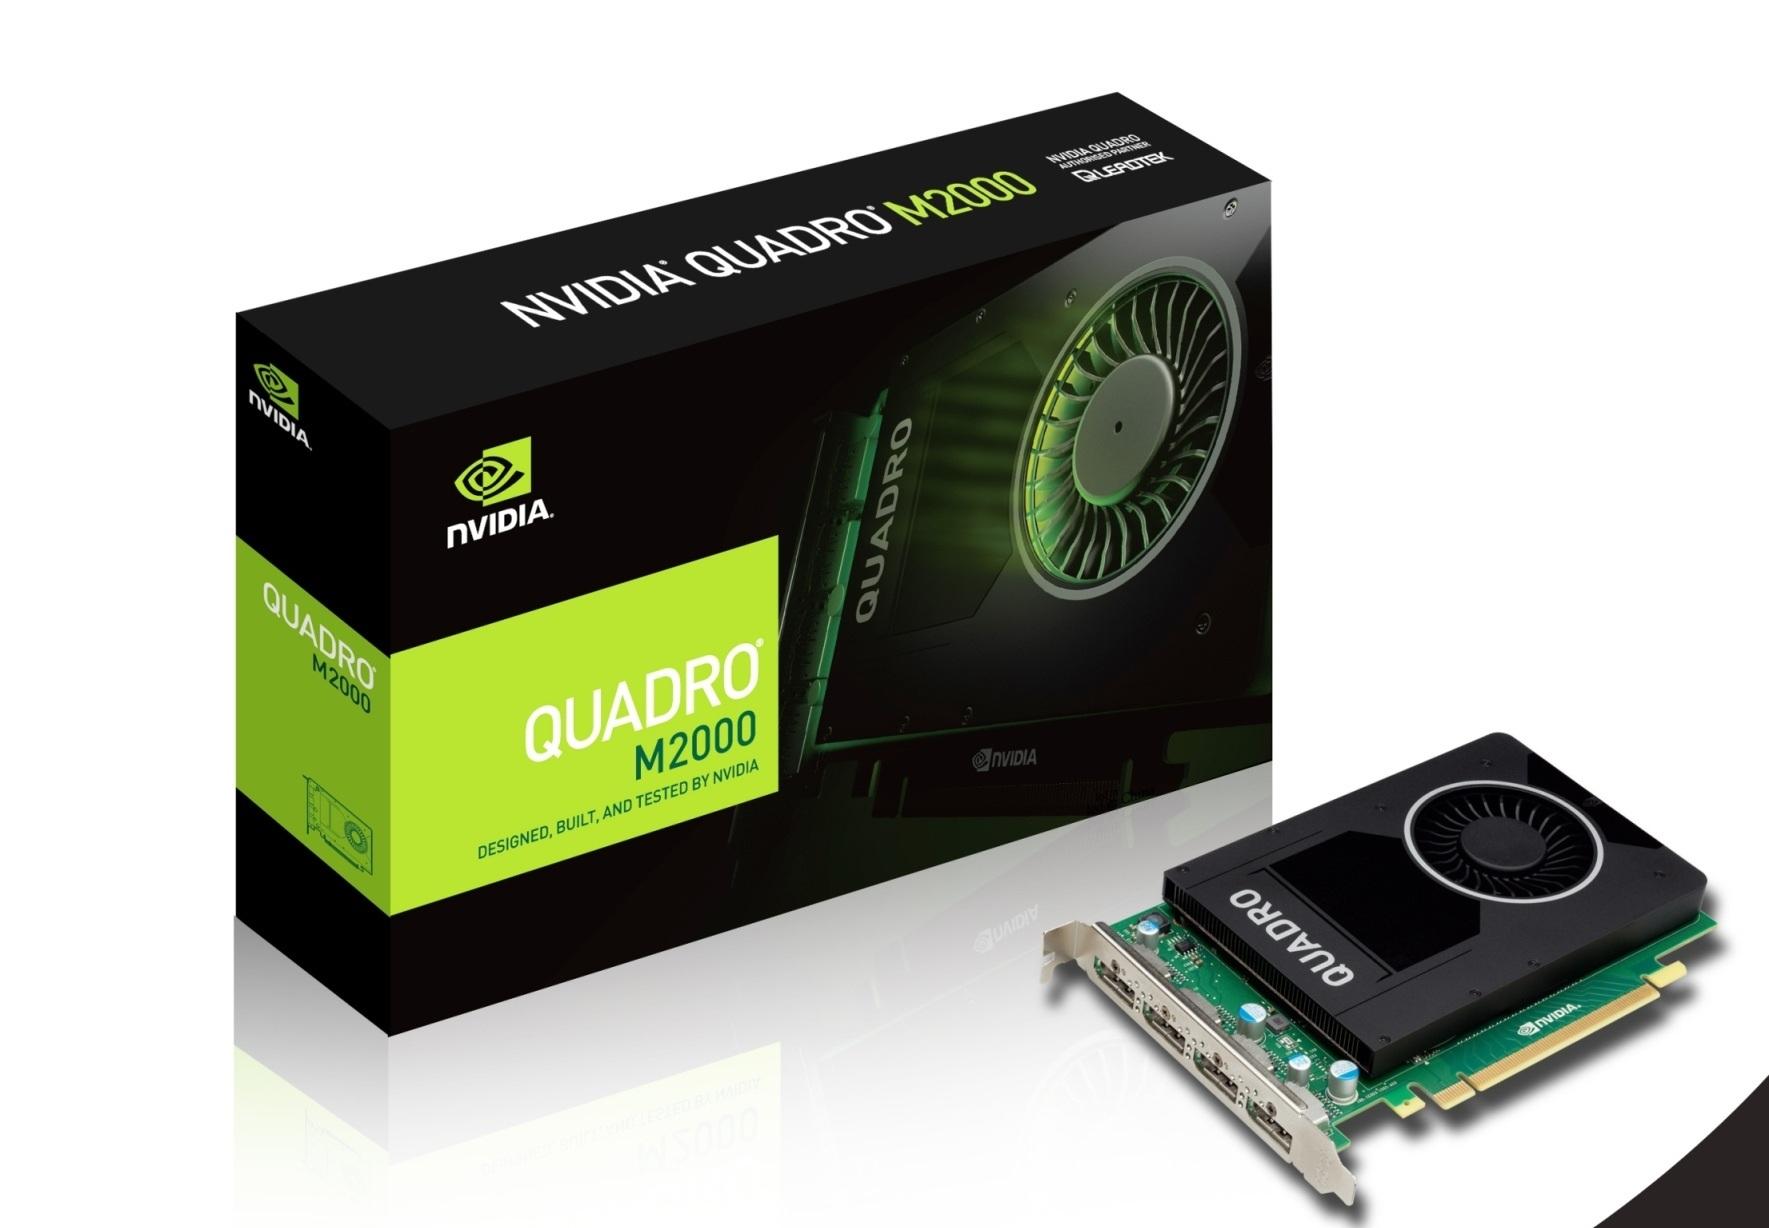 NVIDIA Quadro M2000 graphics card - Quadro M2000 - 4 GB